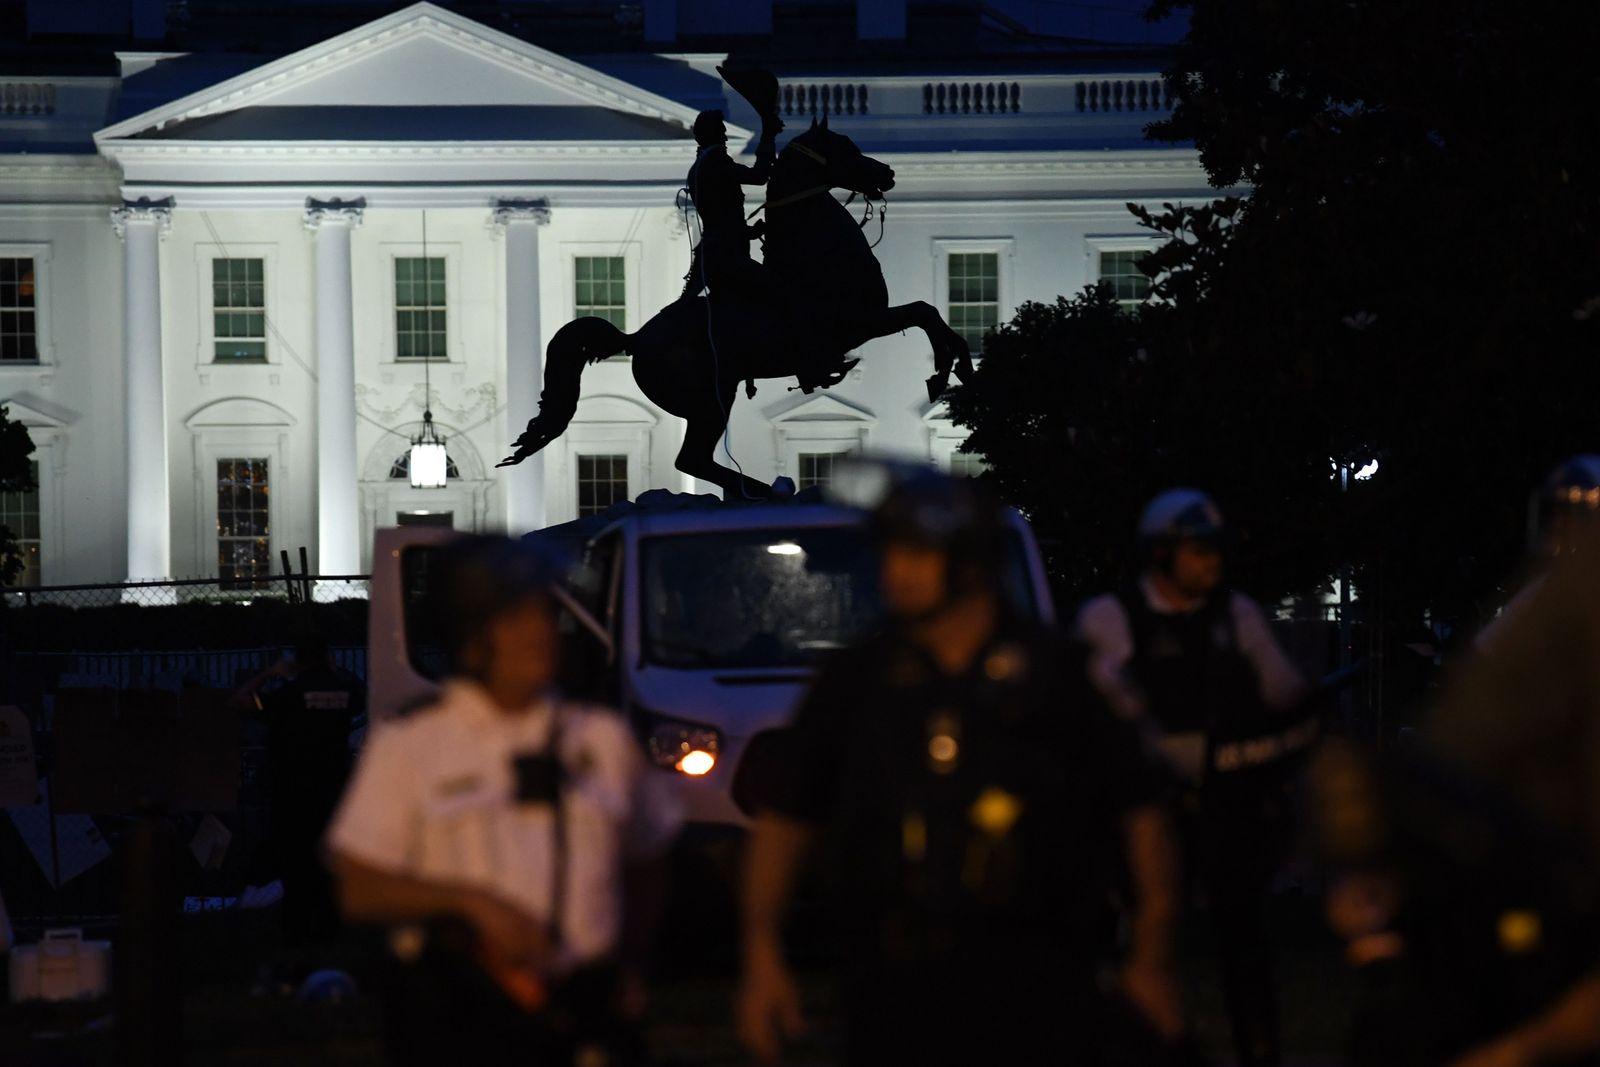 US-POLITICS-RACISM-UNREST-STATUE